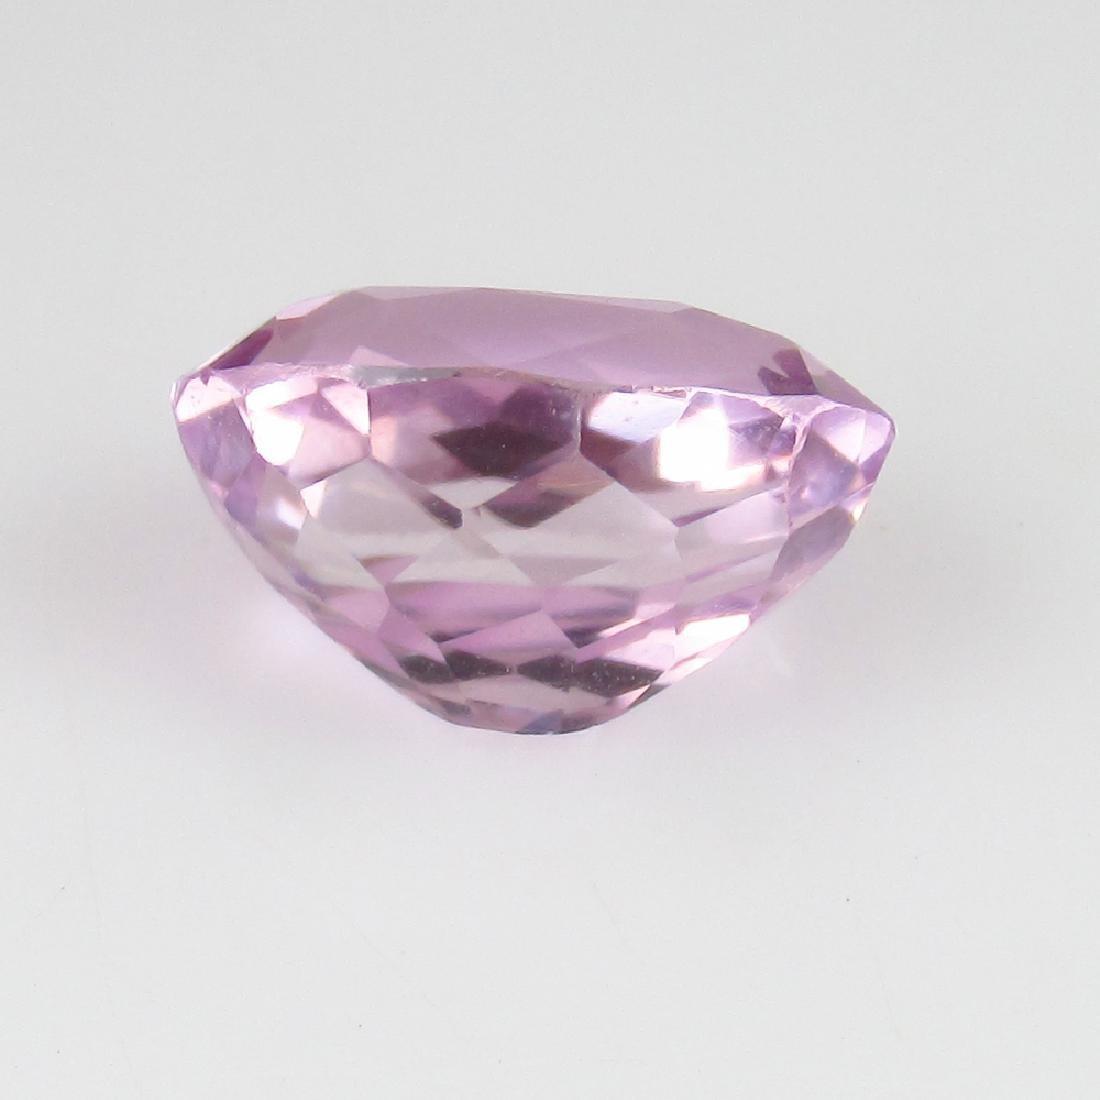 3.55 Ct IGI Certified Genuine Brazil Pink Spodumene - 7